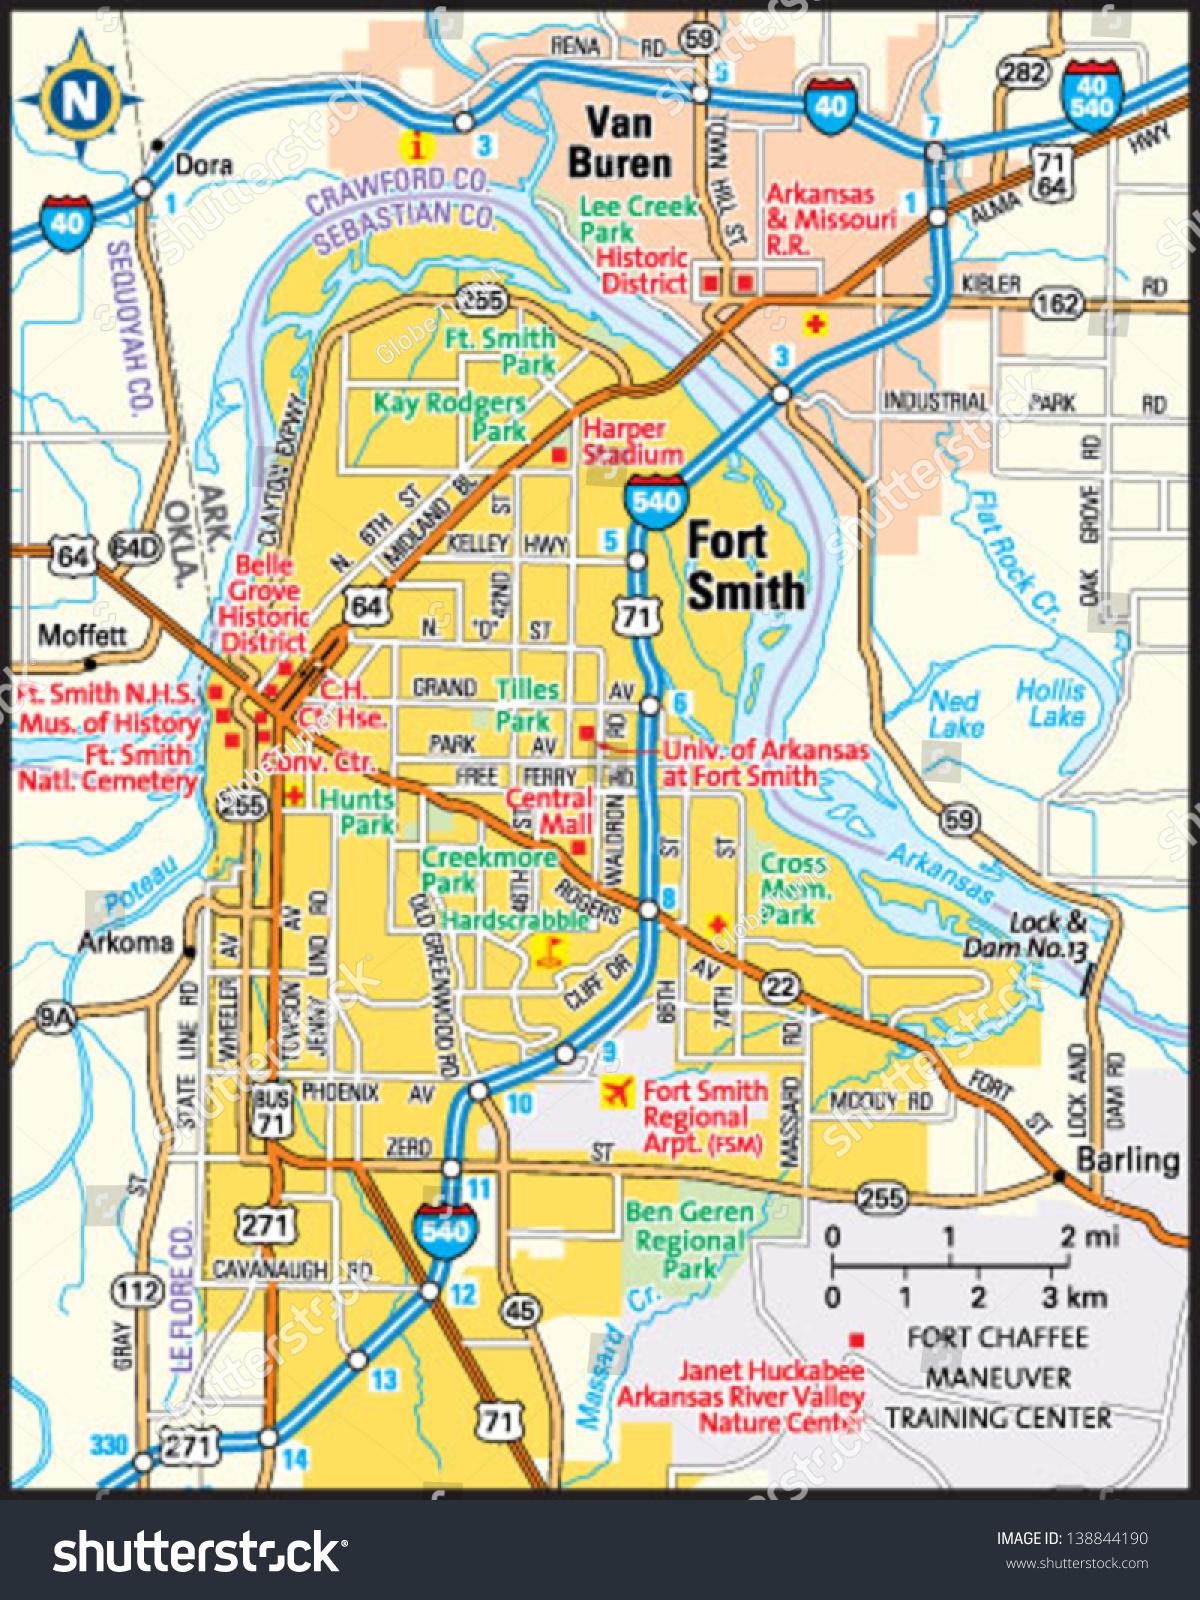 map of ft smith arkansas Fort Smith Arkansas Area Map Stock Vector Royalty Free 138844190 map of ft smith arkansas